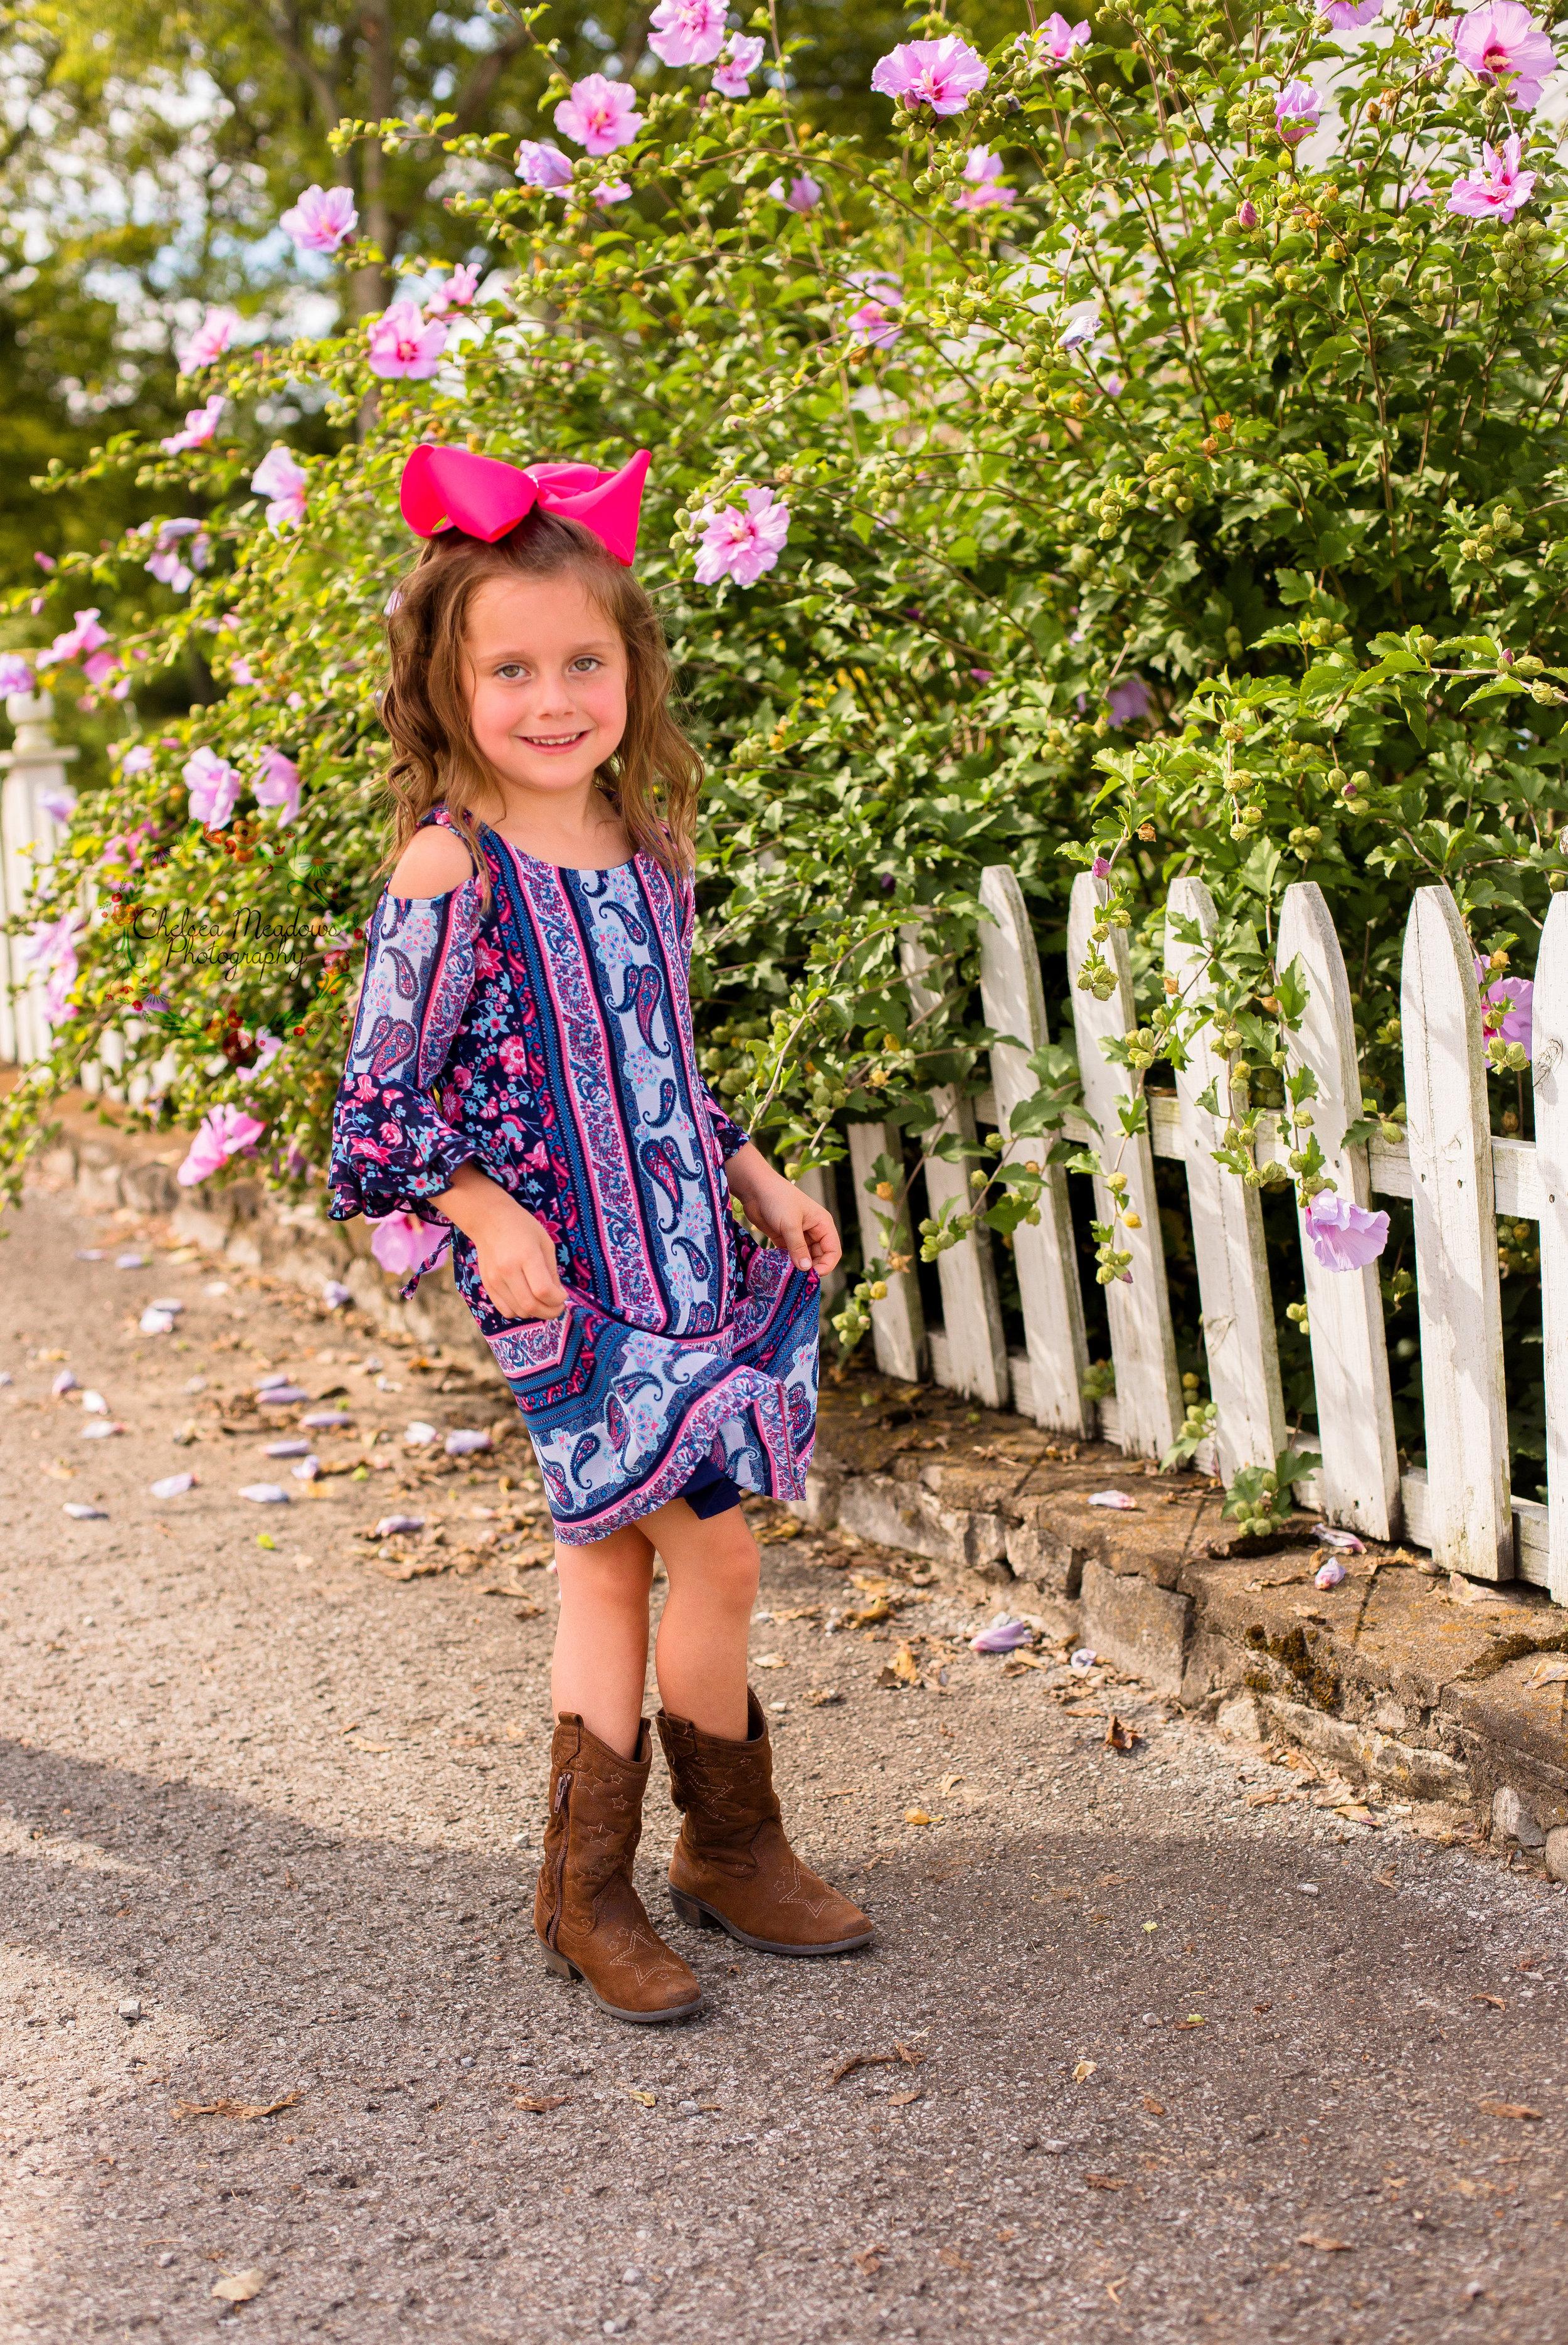 April 6th Birthday - Nashville Family Photographer - Chelsea Meadows Photography (15).jpg